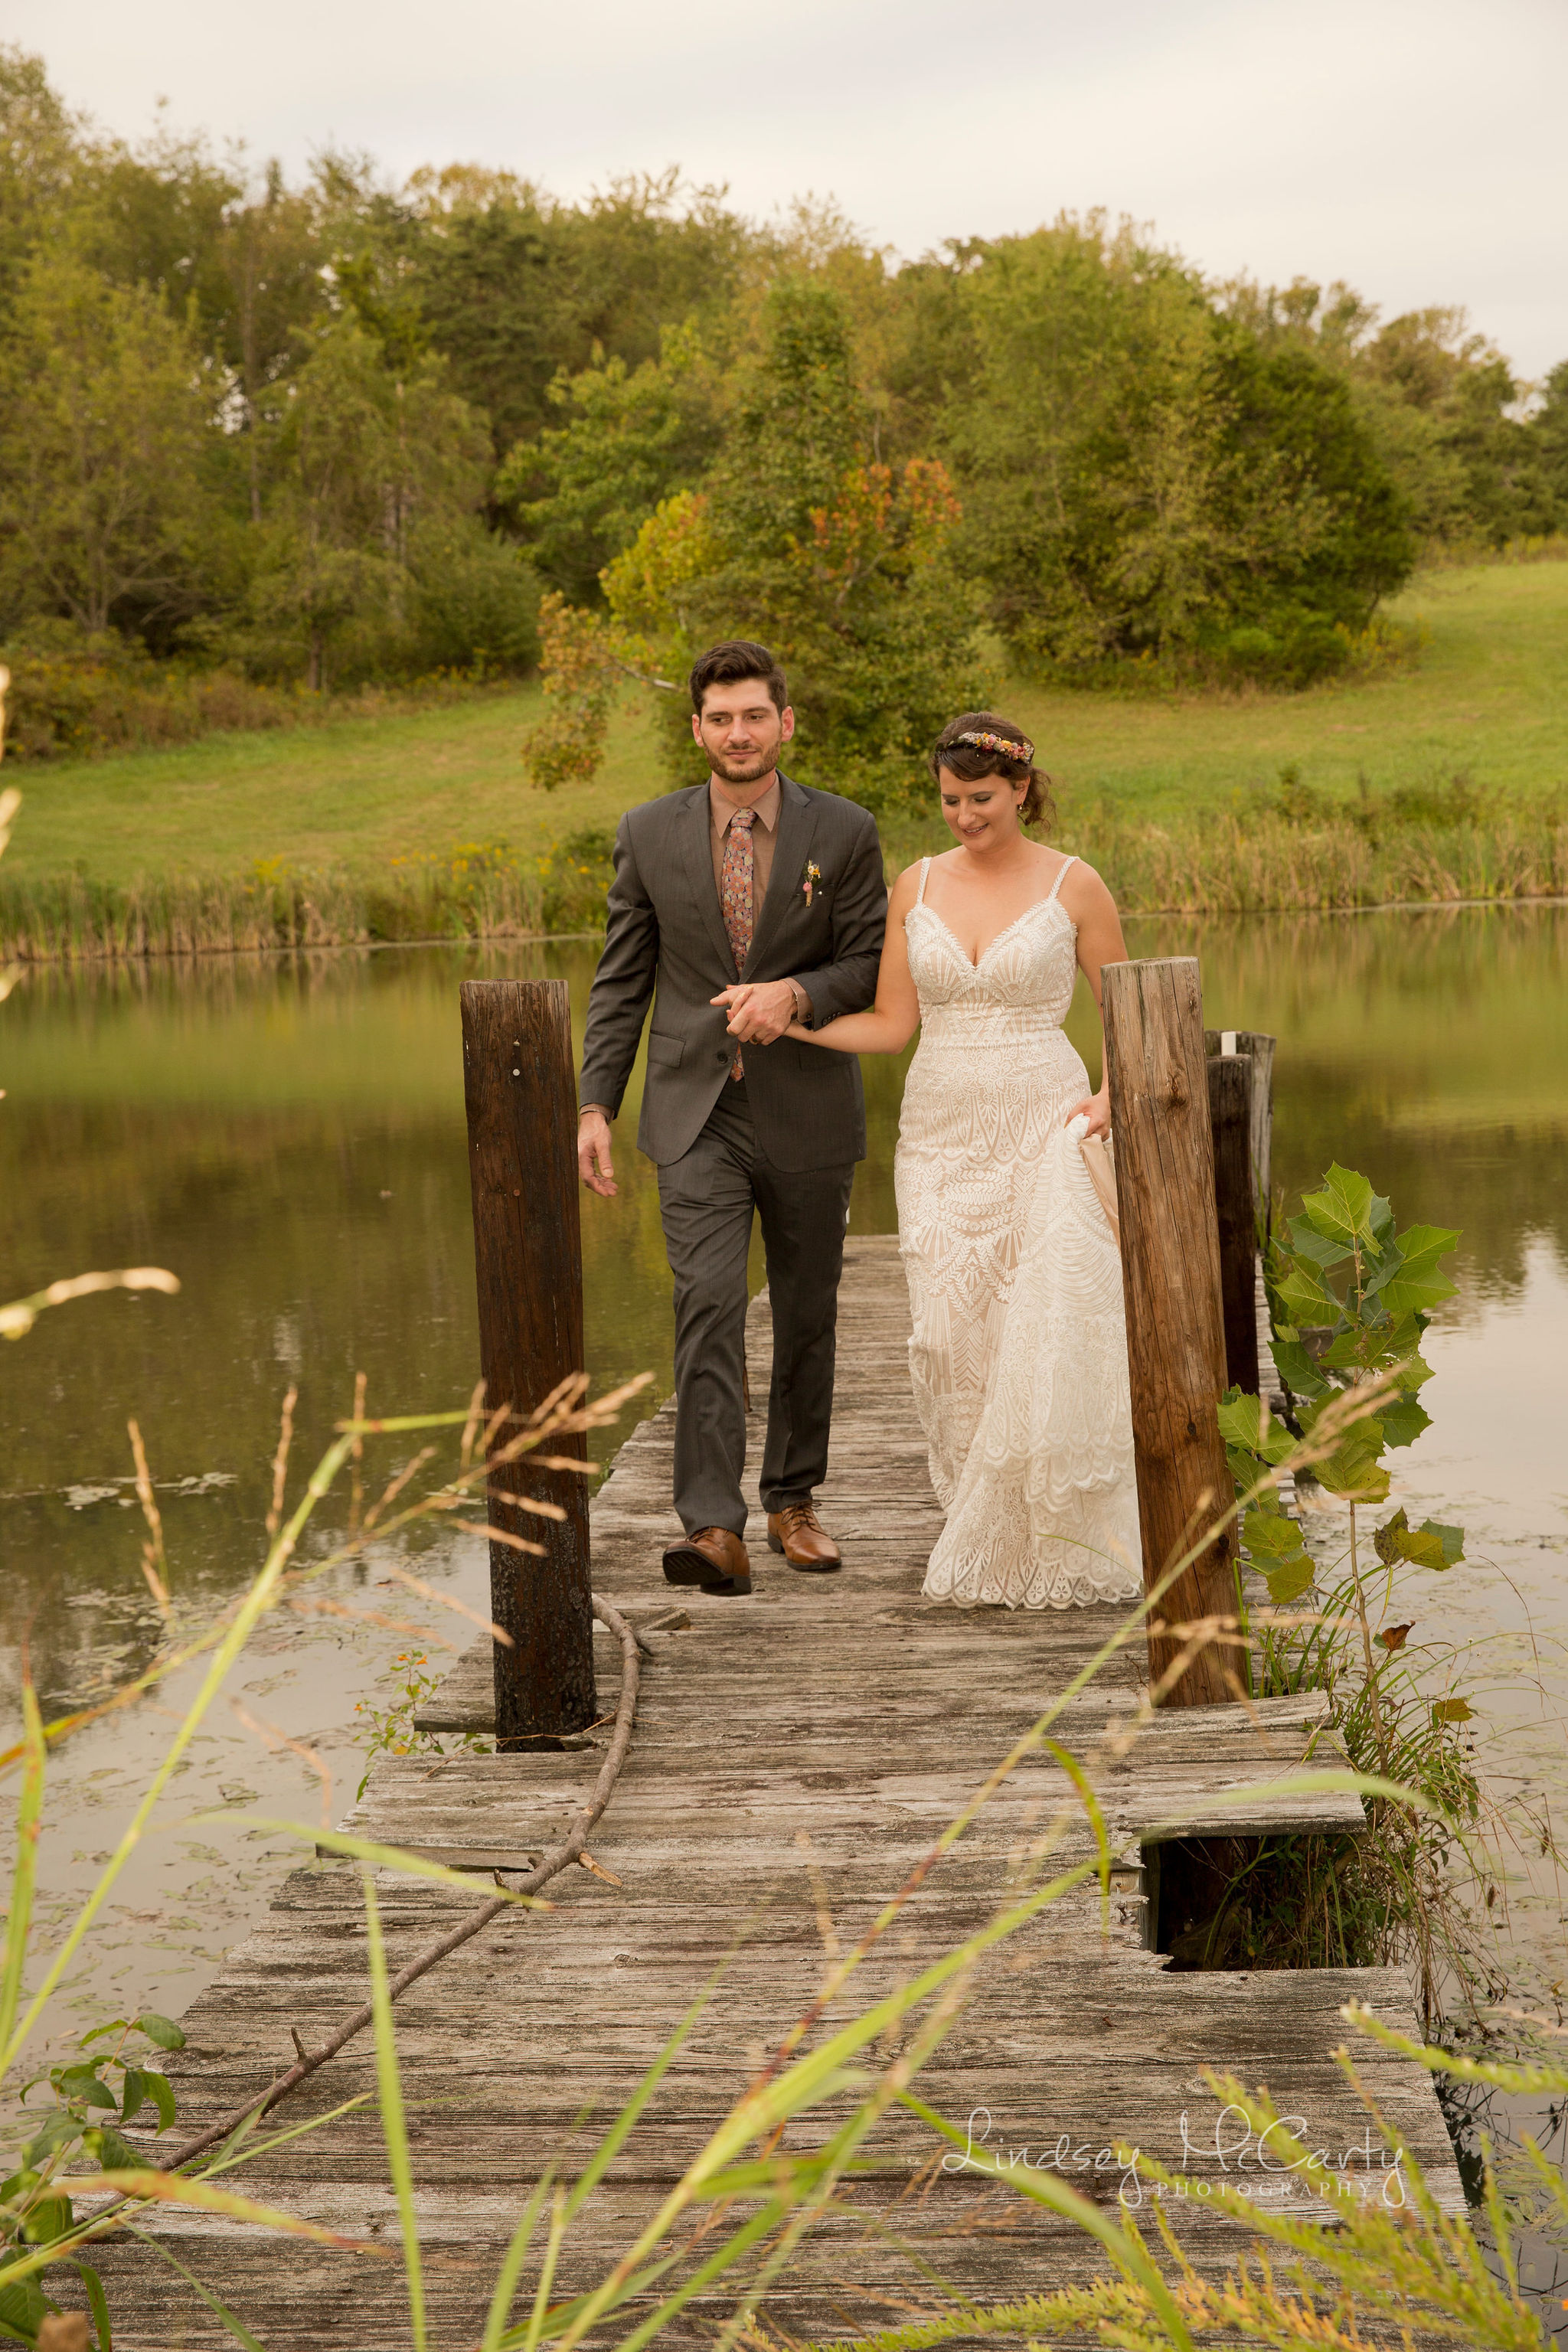 Boxtree Lodge Wedding | Boxtree Lodge VA | Roanoke area wedding photography | Boxtree Lodge wedding photography | Boxtree Lodge wedding photographer | wedding venues in Vinton | wedding venues in Roanoke